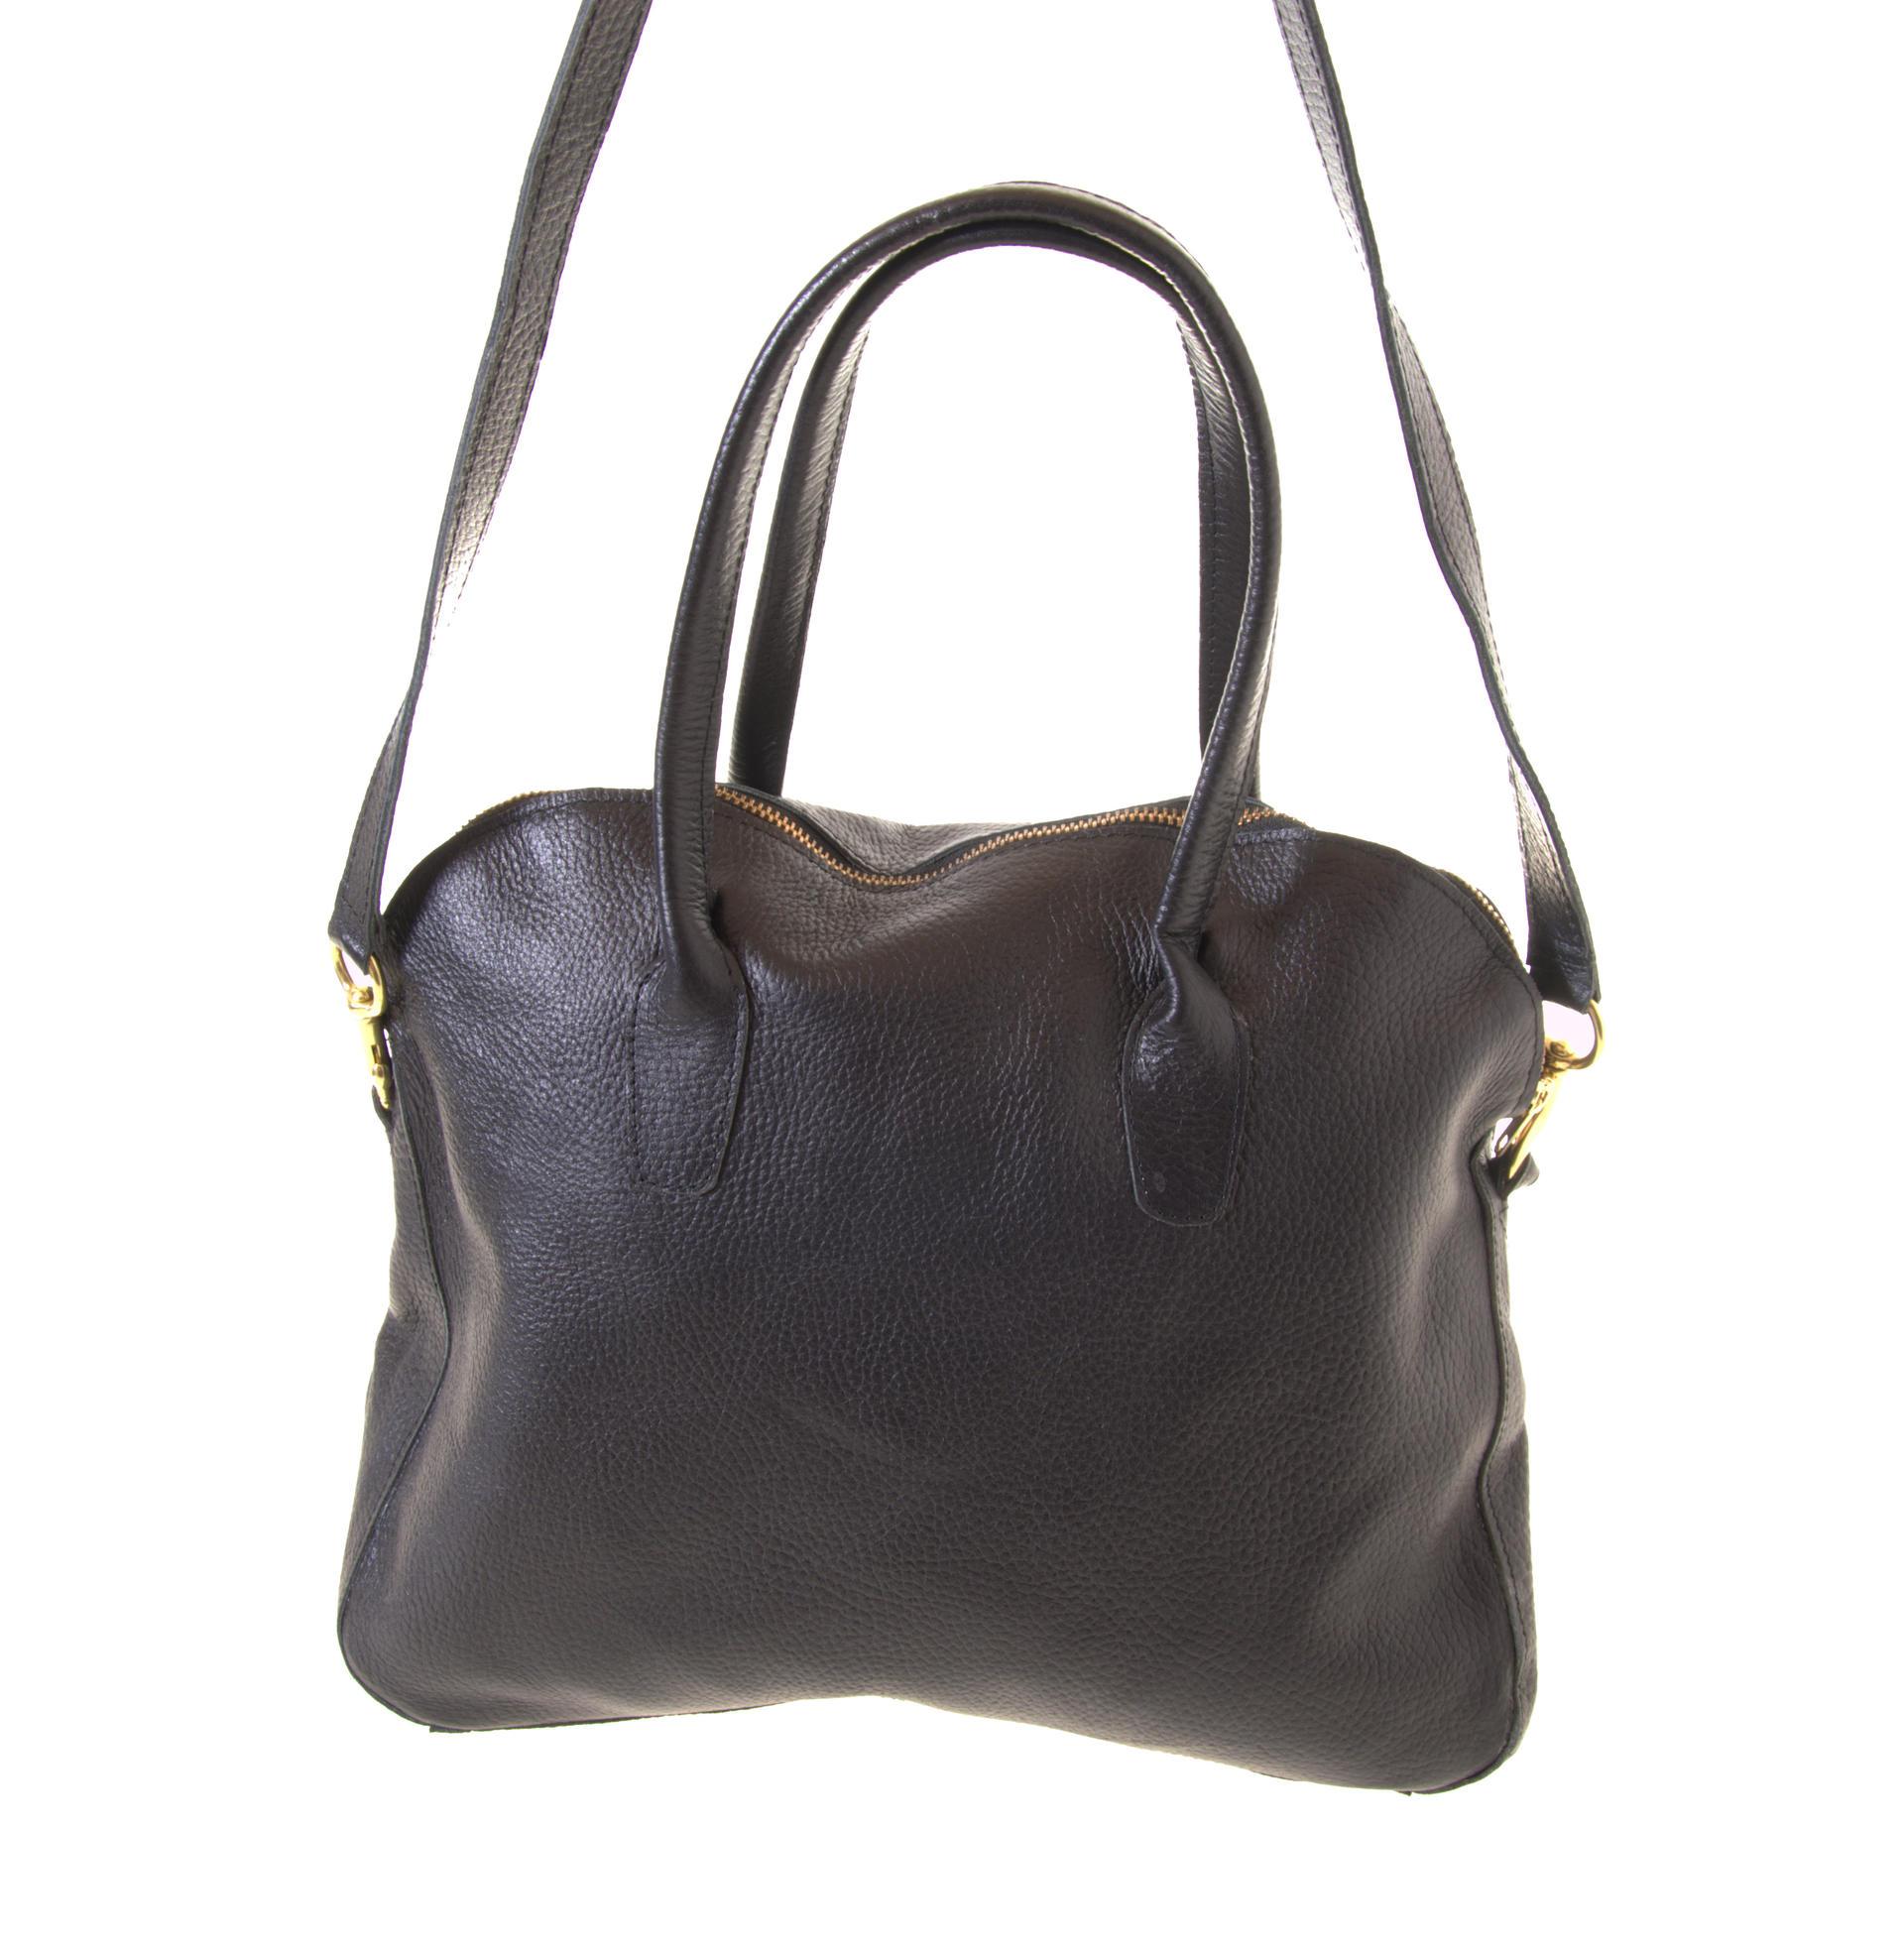 Black handbag with a strap